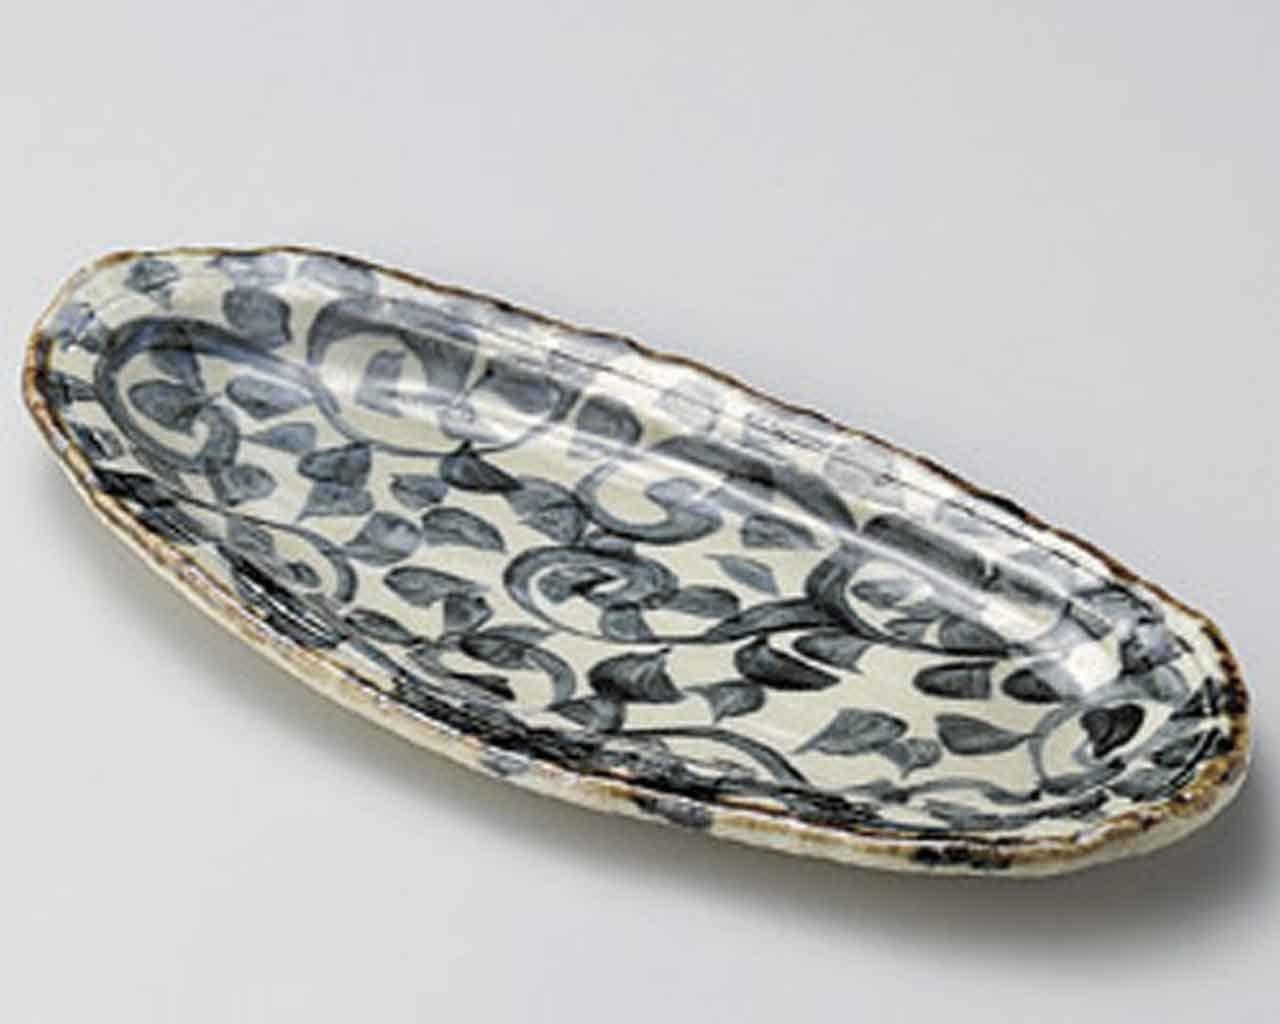 Tako Karakusa Oval 12.6inch Set of 2 Medium Plates Beige Ceramic Made in Japan